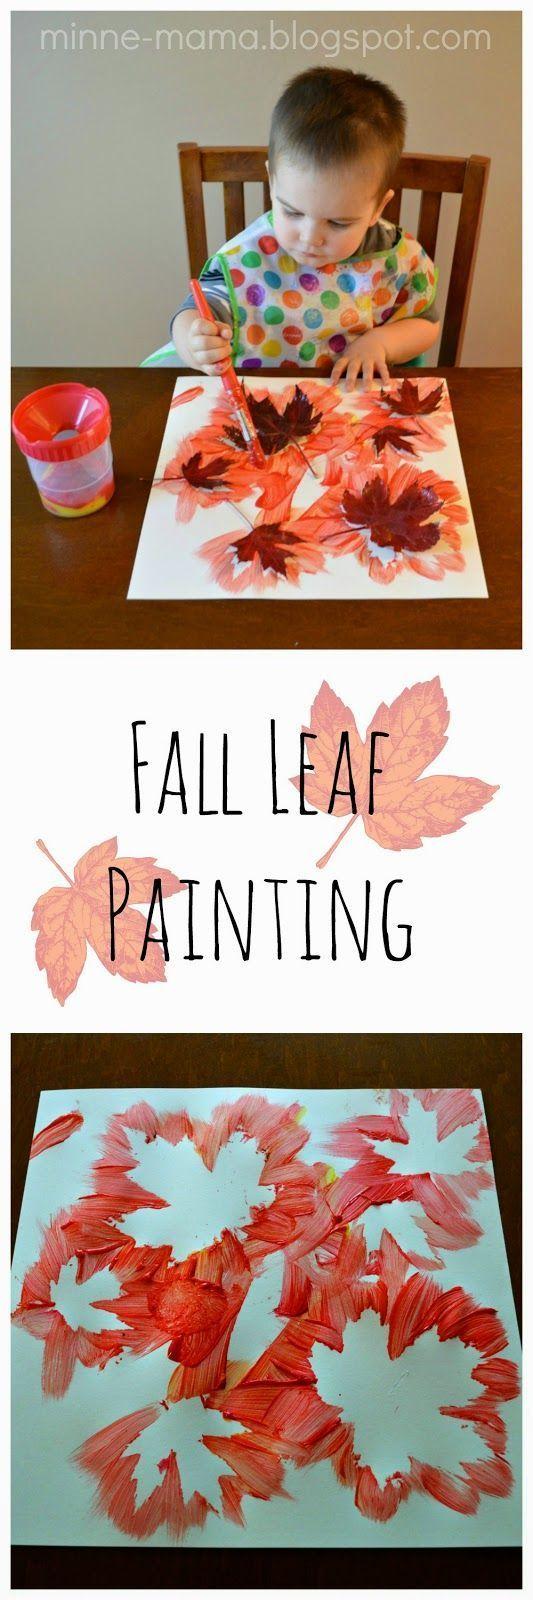 Fall Leaf Painting #preschoolers